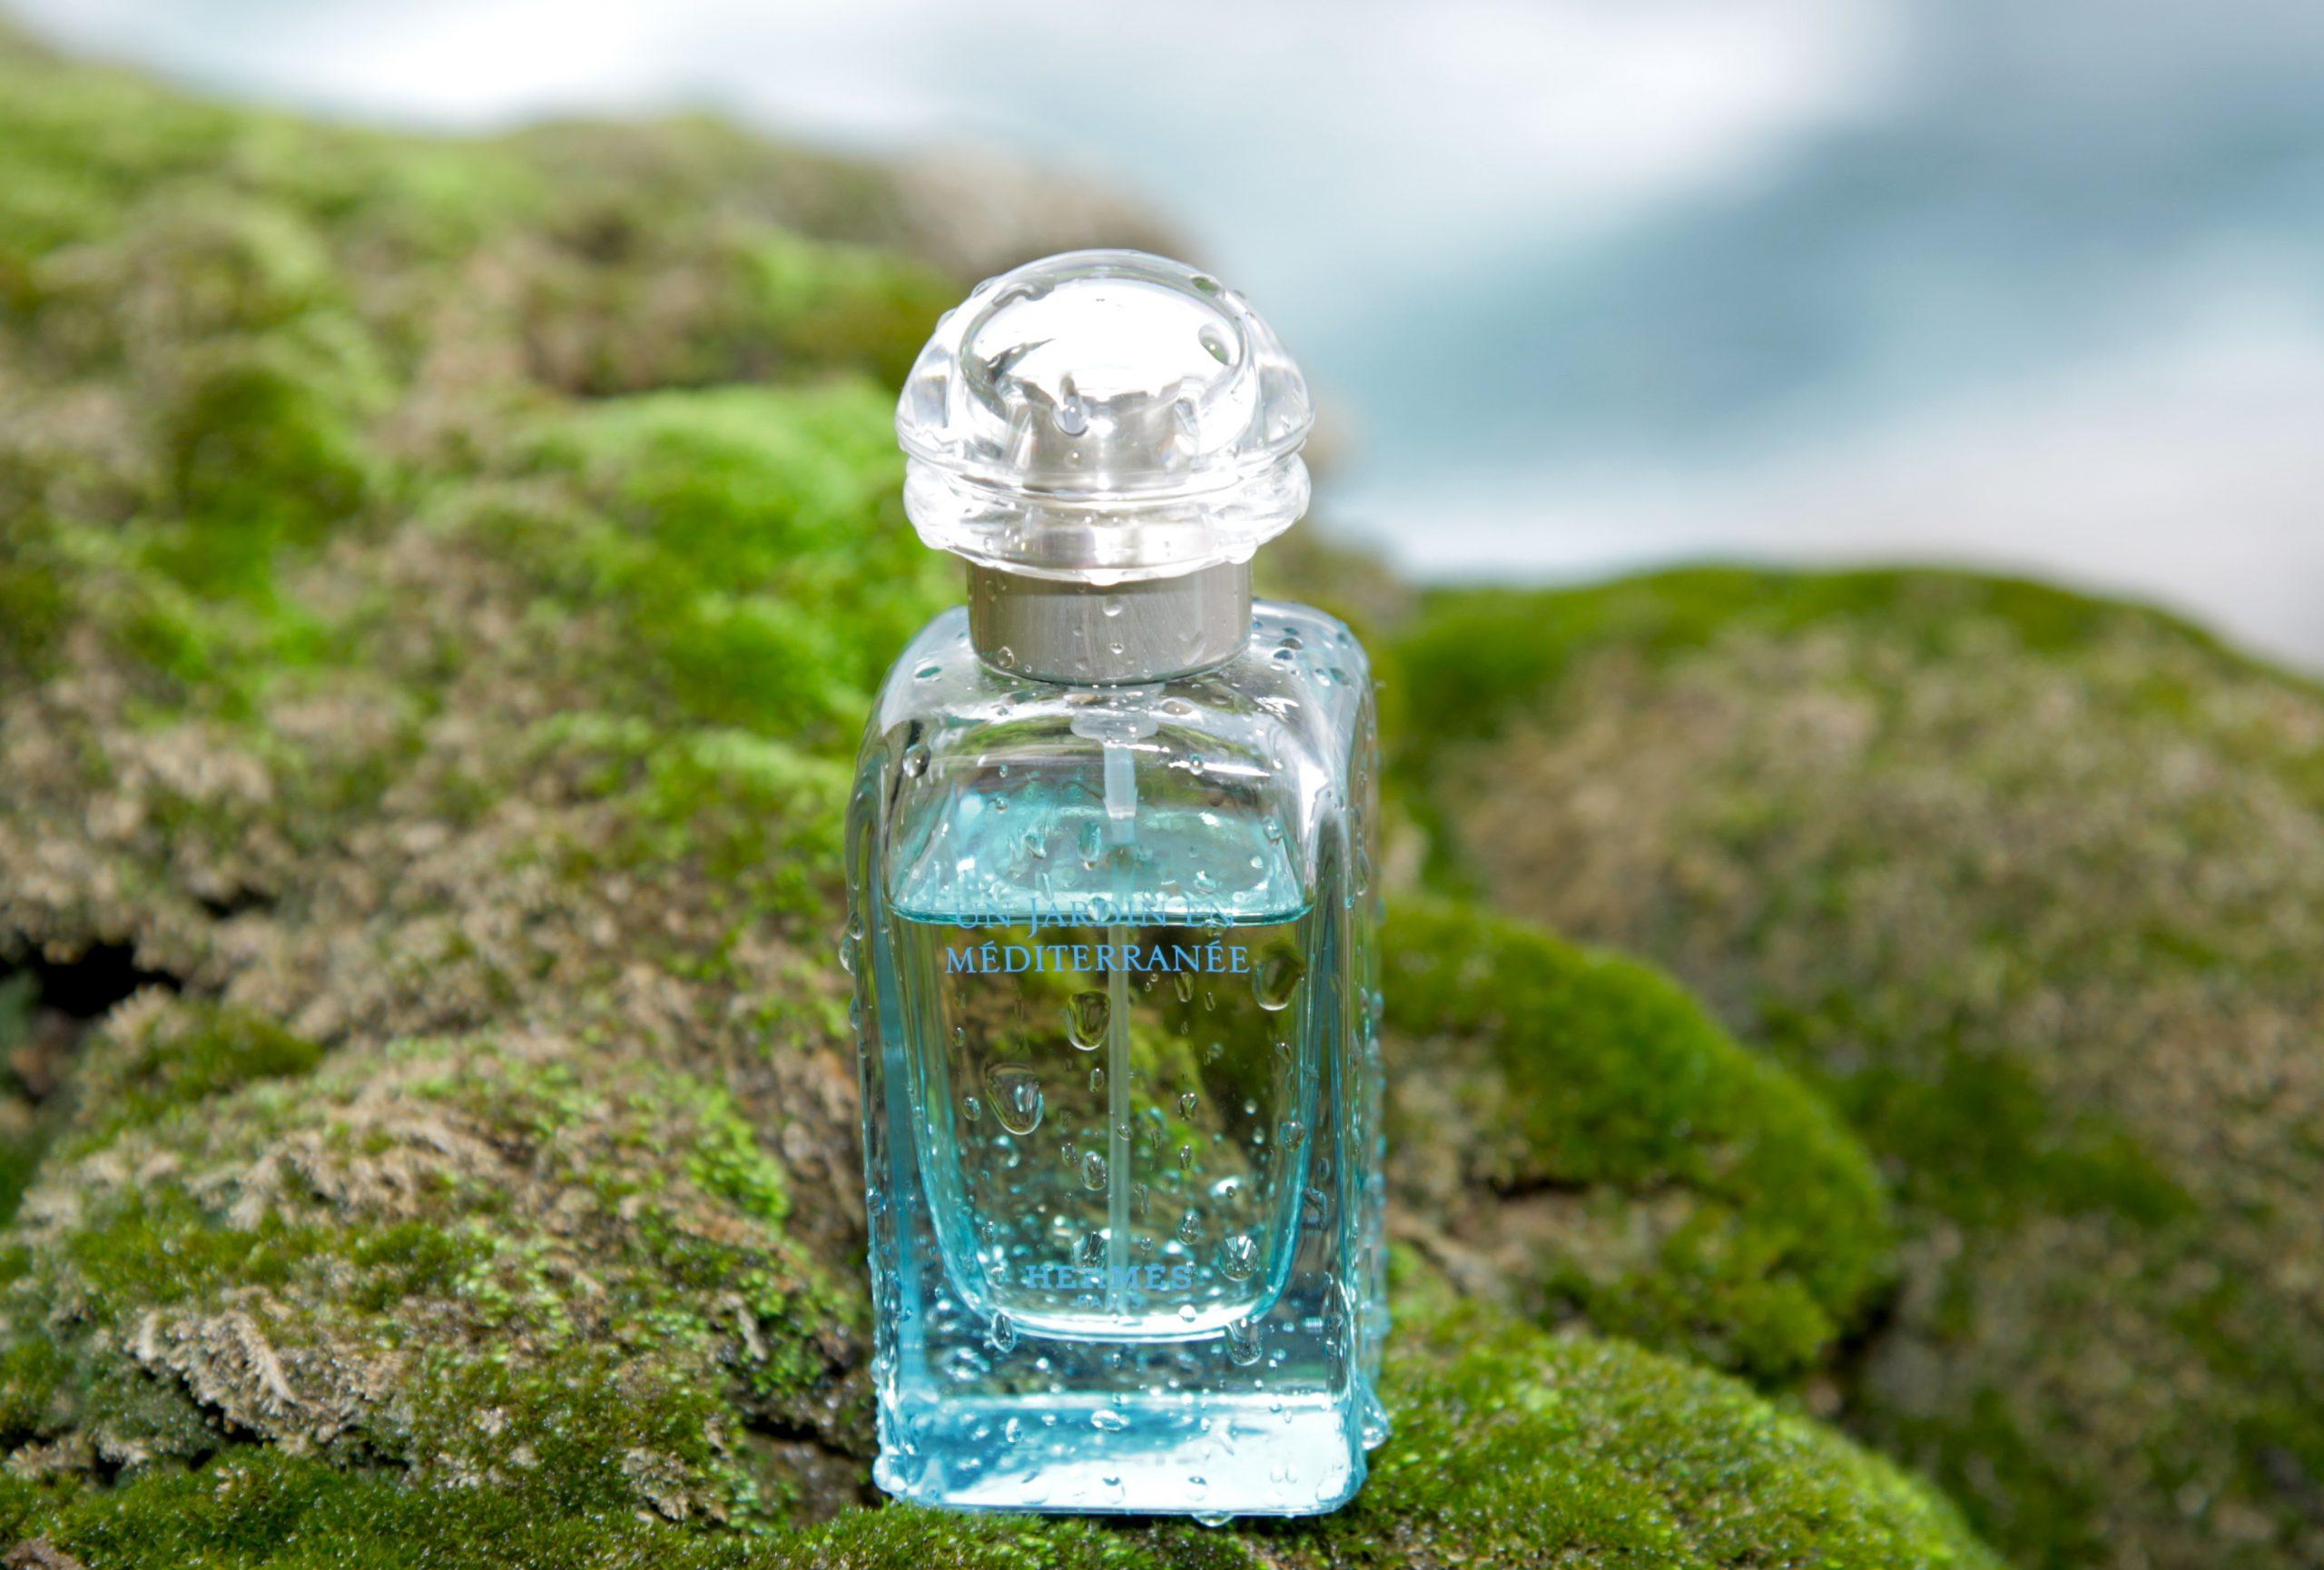 Hermes Un Jardin En Mediterranée – Take Me Away | The Other ... tout Un Jardin En Mediterranée